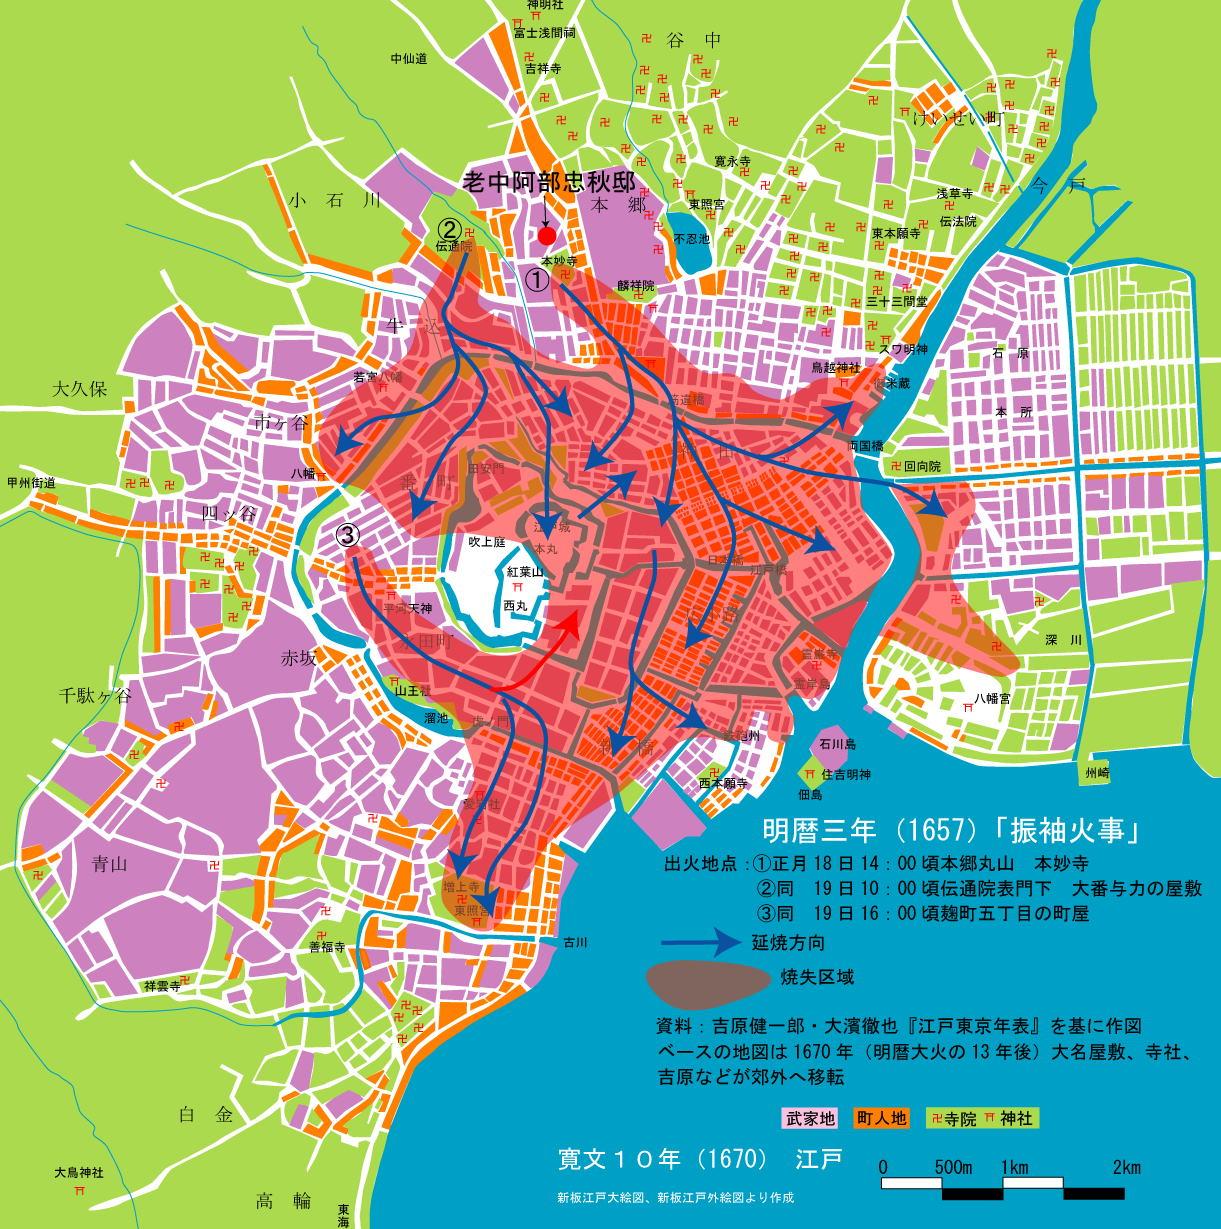 meirekitaika1657地図